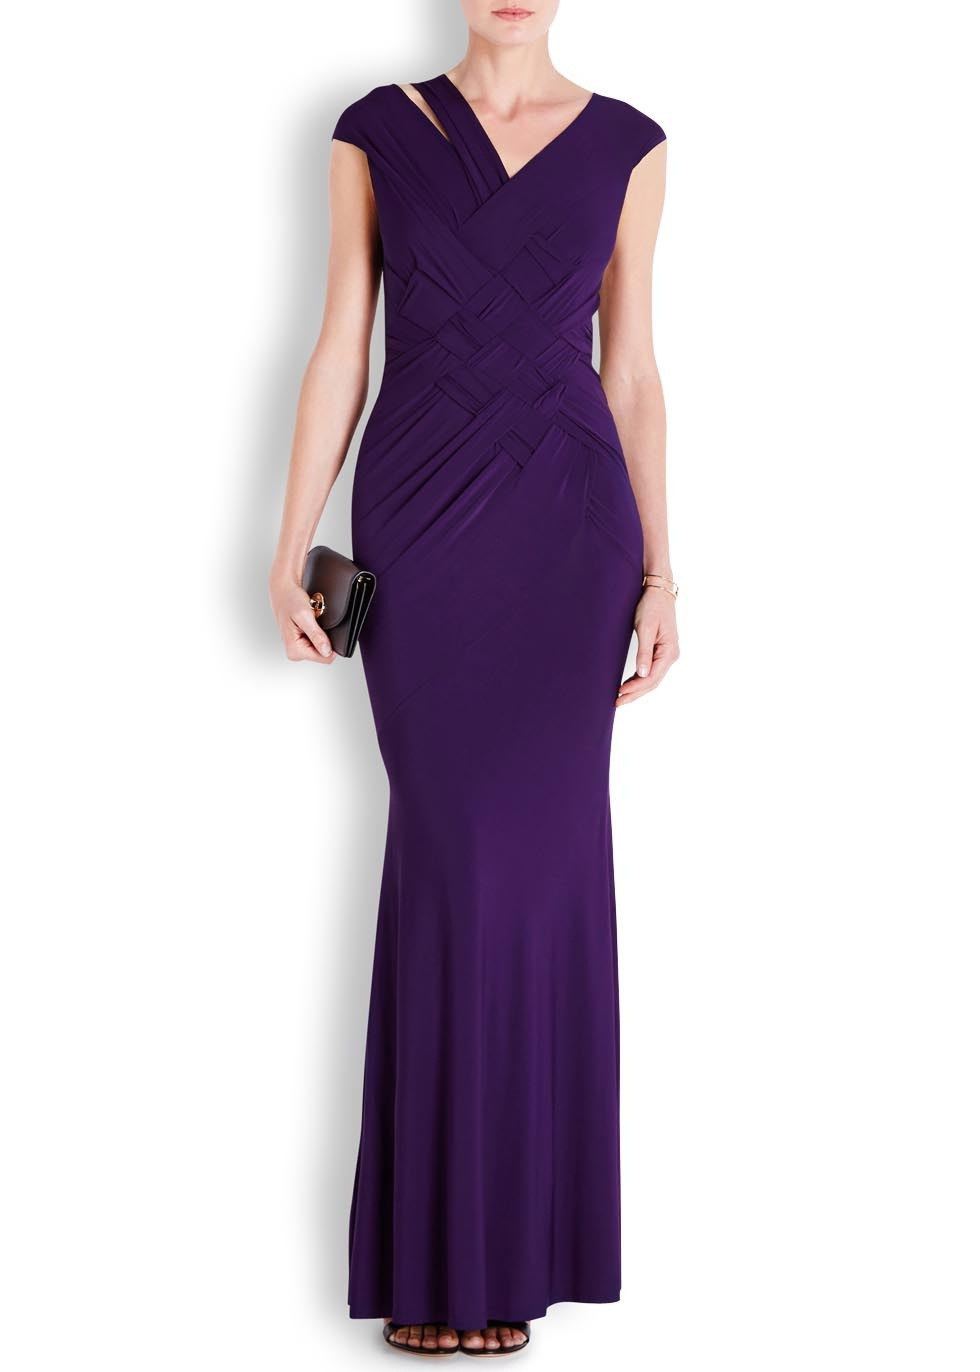 Donna karan new york purple woven detail jersey gown in for Donna karan new york